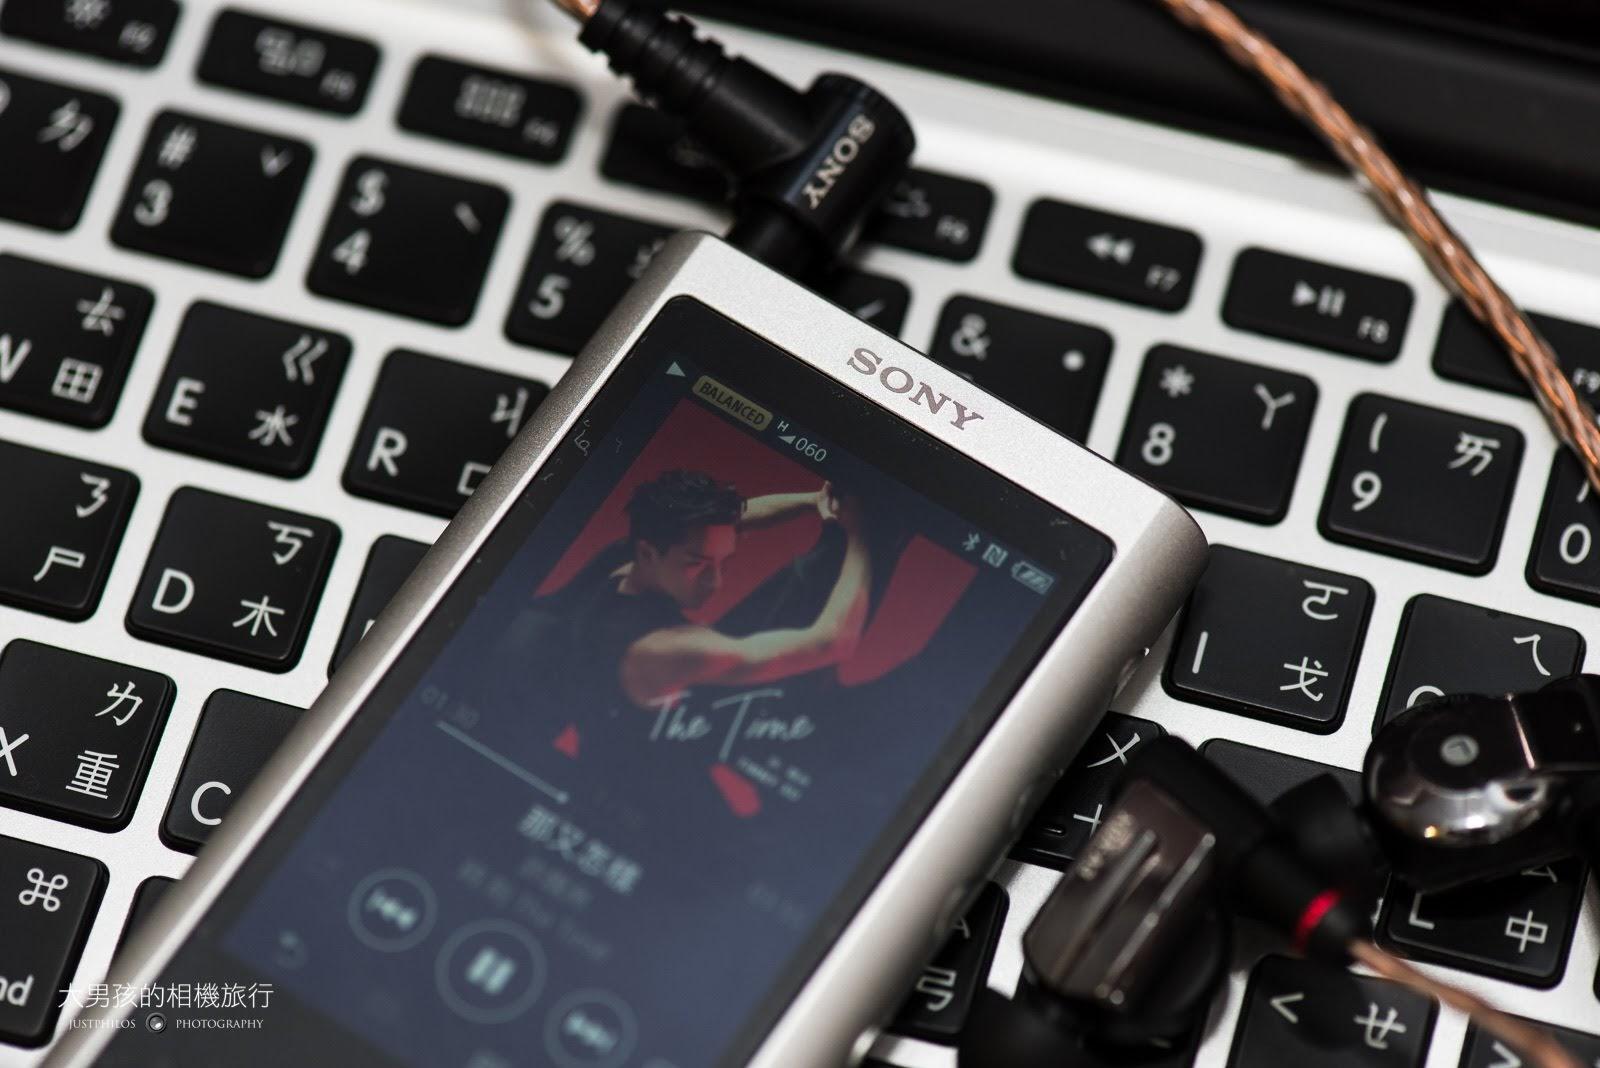 Sony Walkman系列一直以來無論音質或外觀都保持高水準的呈現。